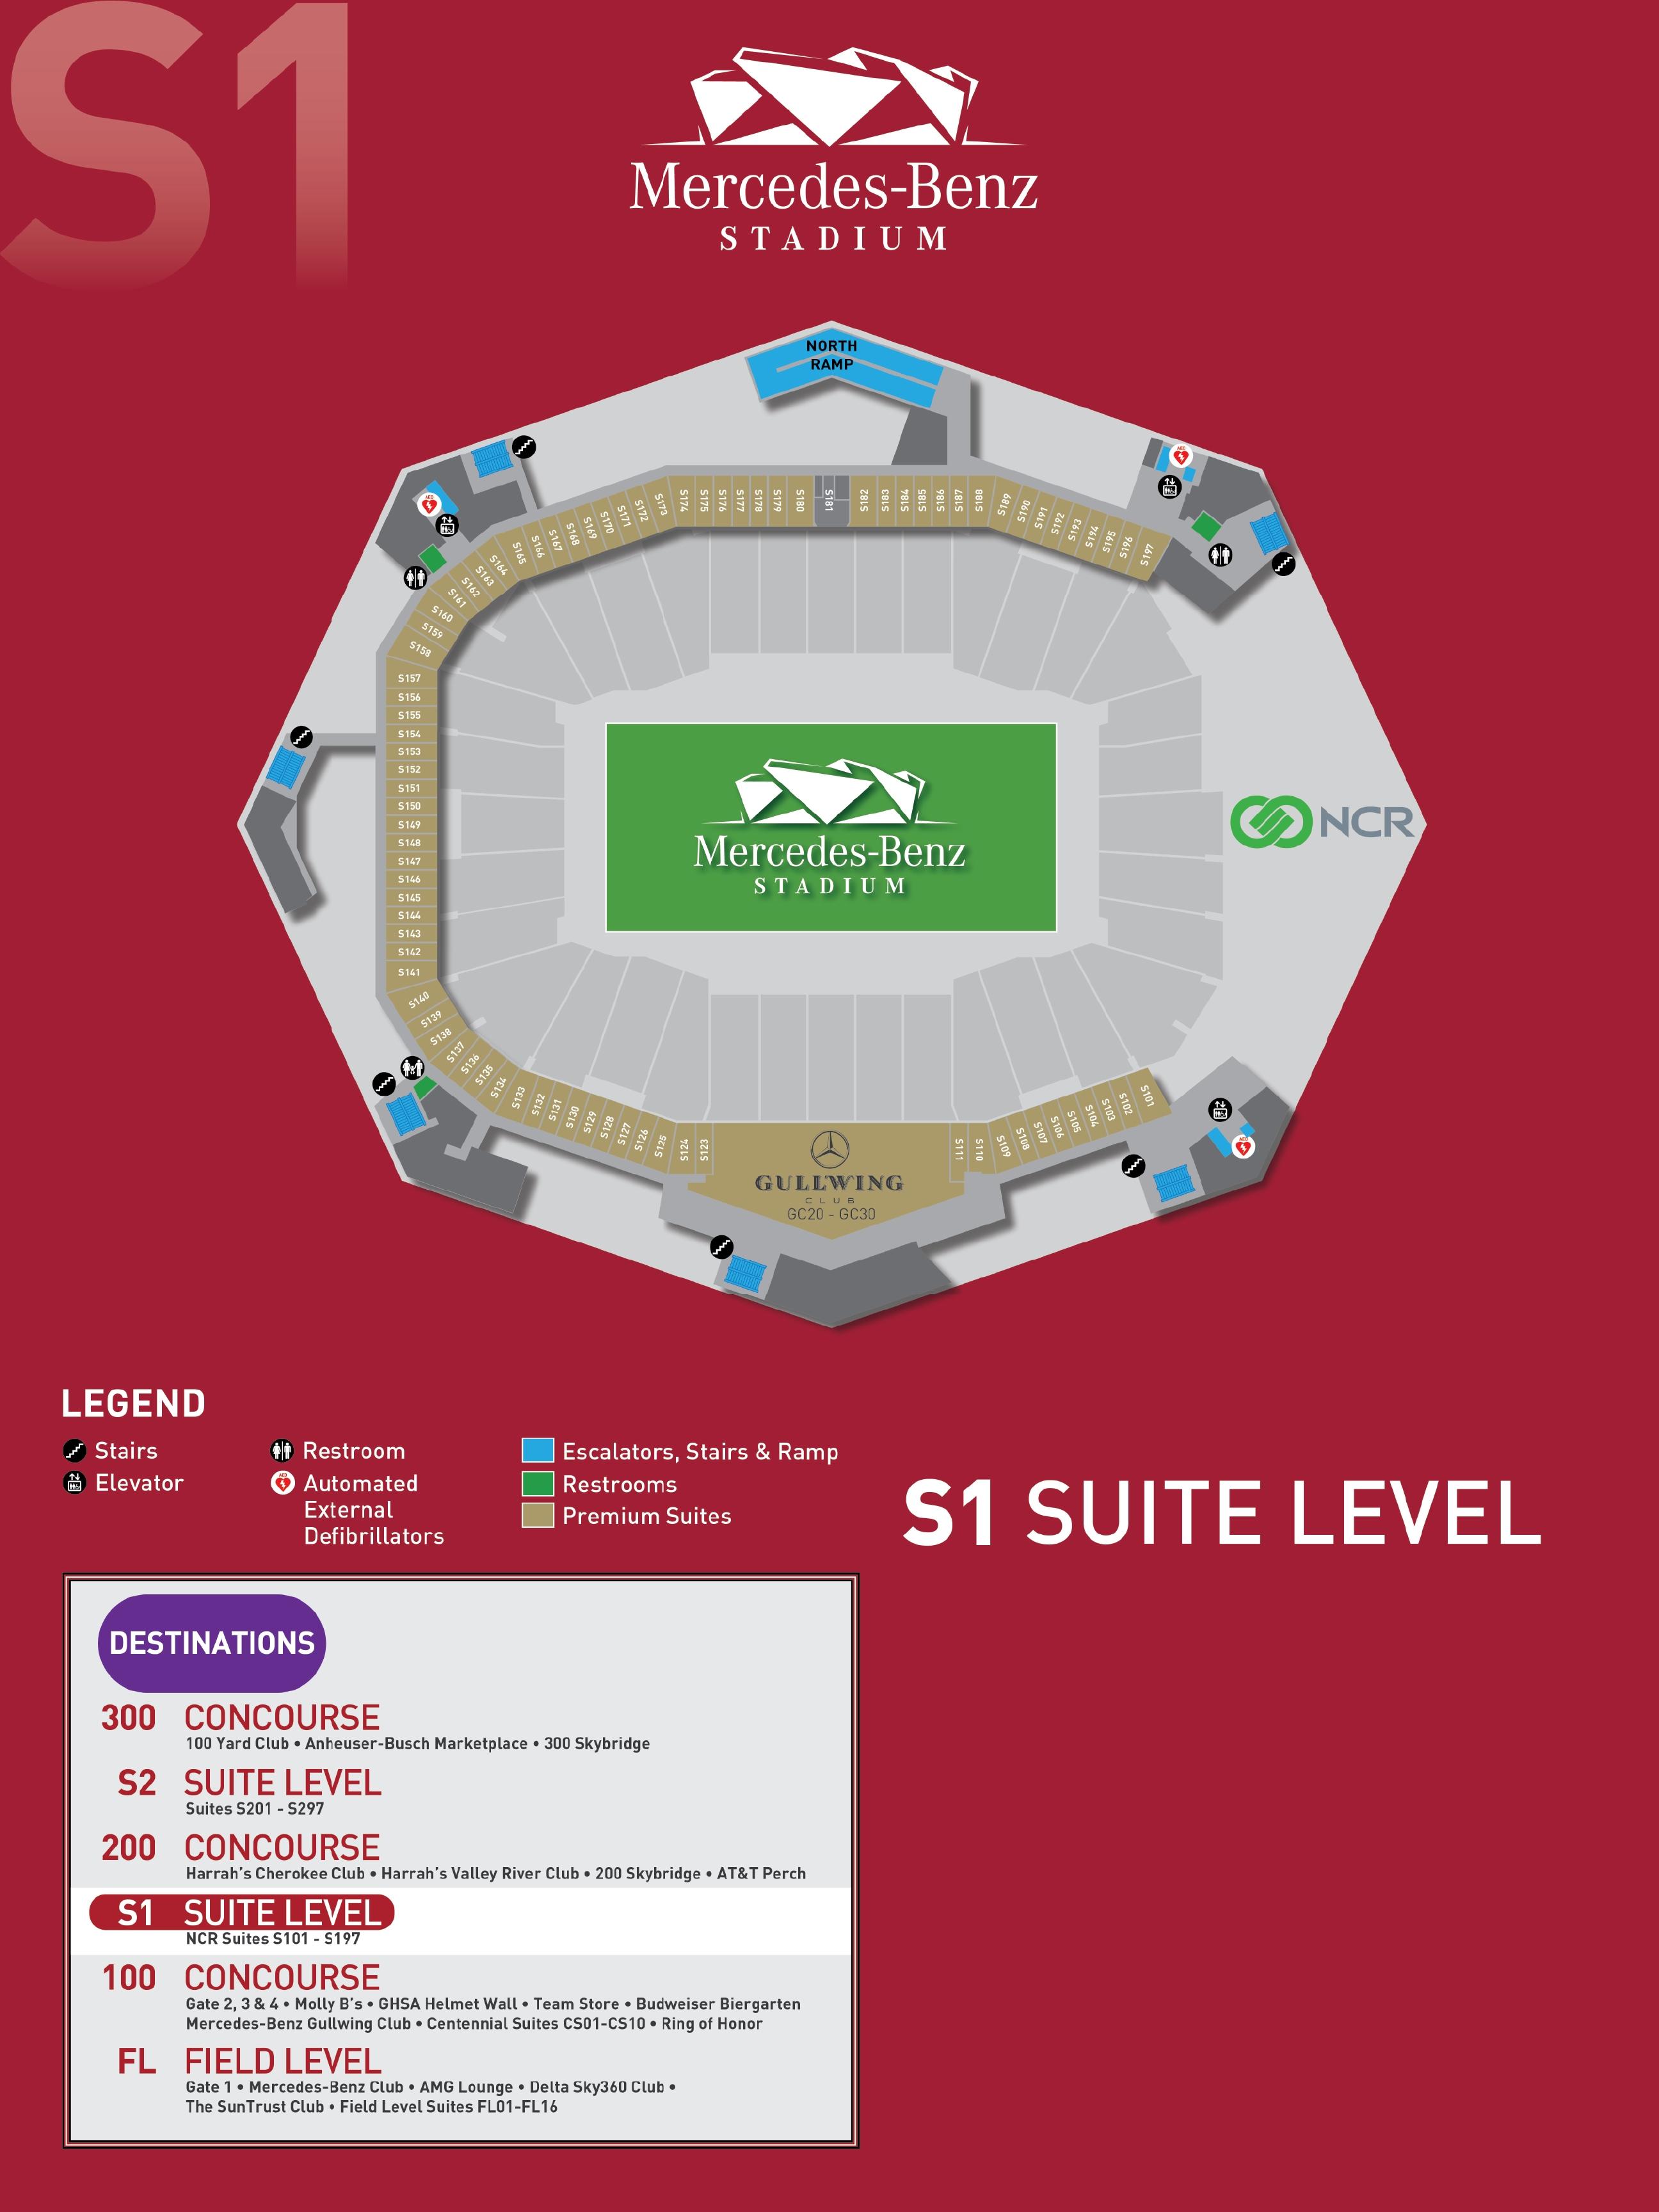 Stadium Maps - Mercedes Benz Stadium inside Mercedes Benz Stadium Super Bowl Seating Chart